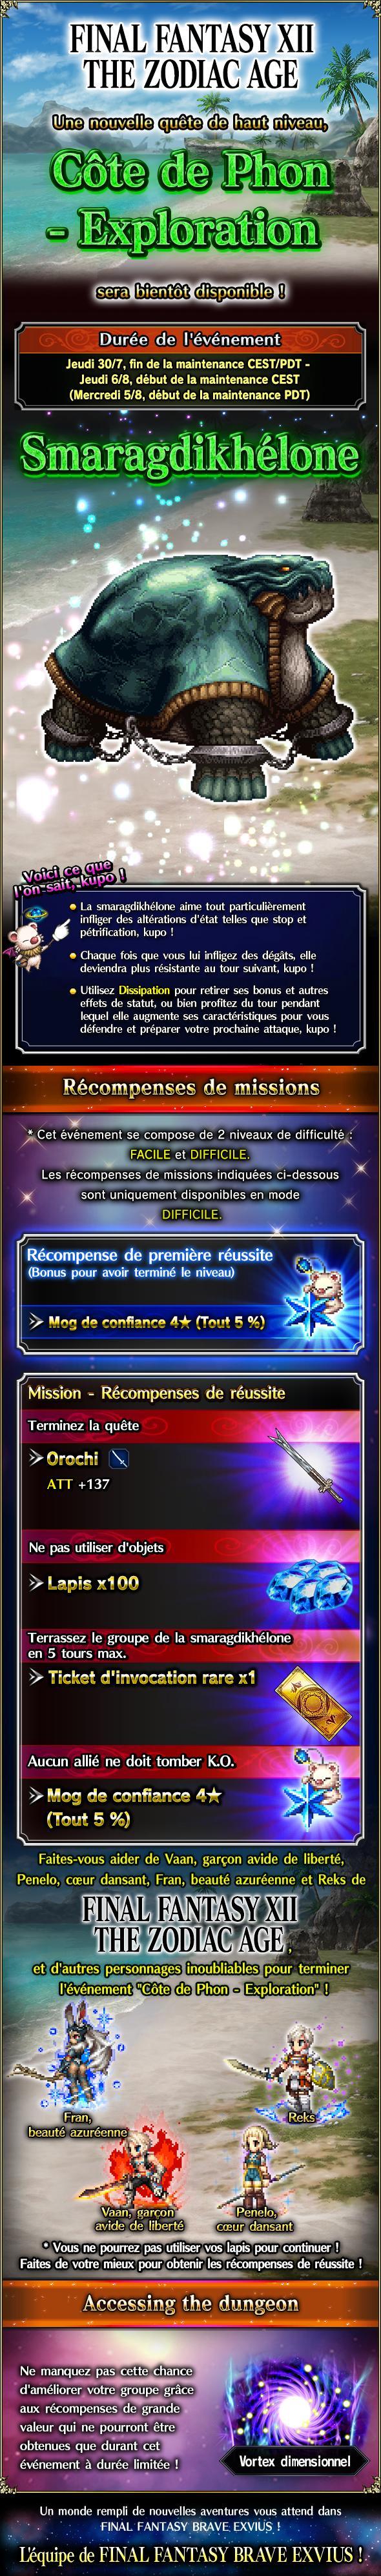 Trial MK FFXII-TZA - Côte de Phon (Exploration) - du 30/07 au 13/08/20 20200728FFXIITZAThePhonCoastExploration